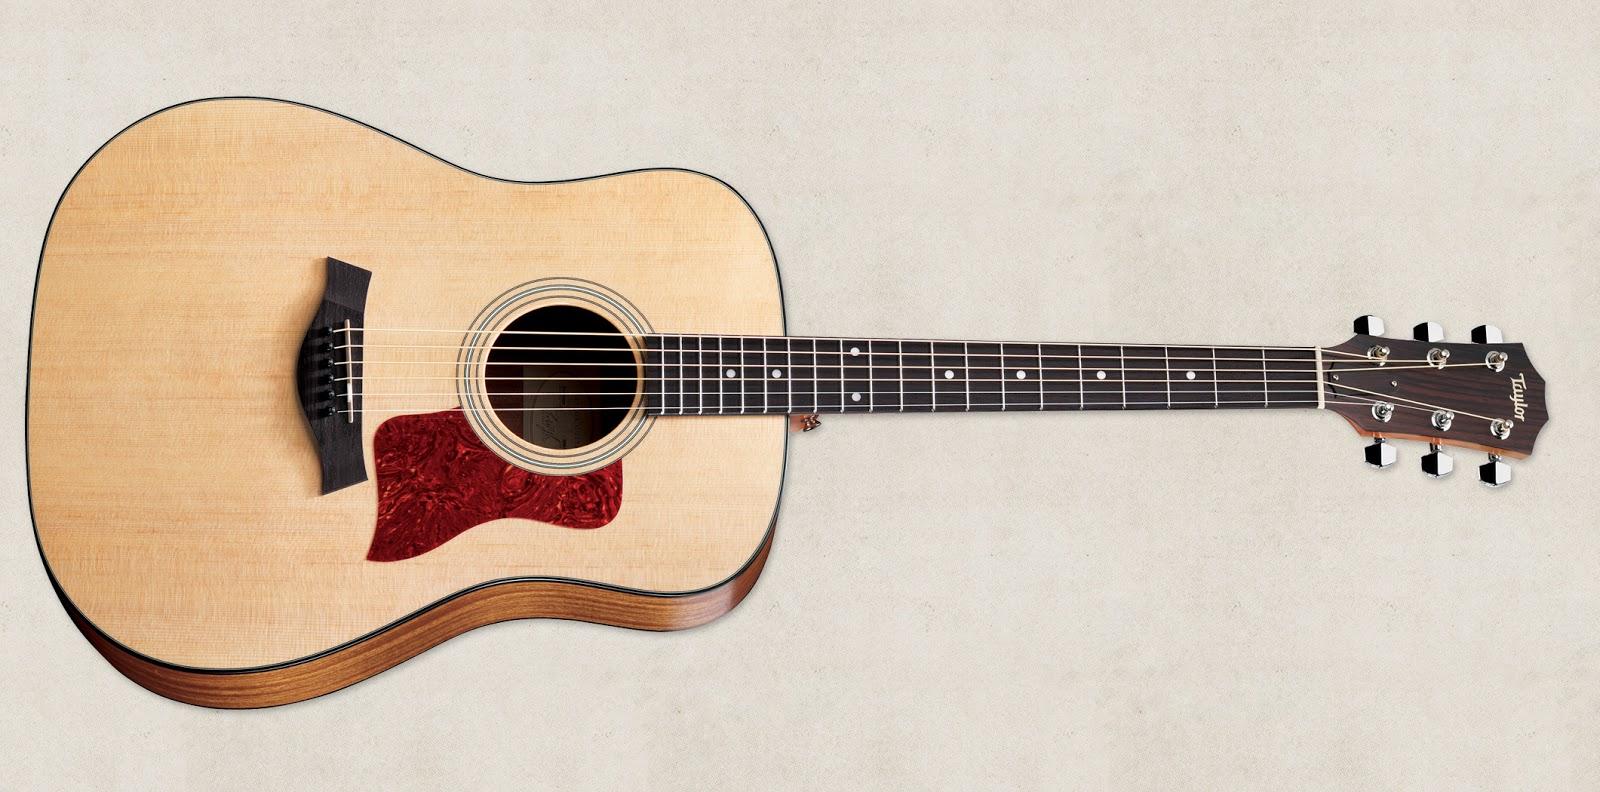 Taylor guitar clipart.